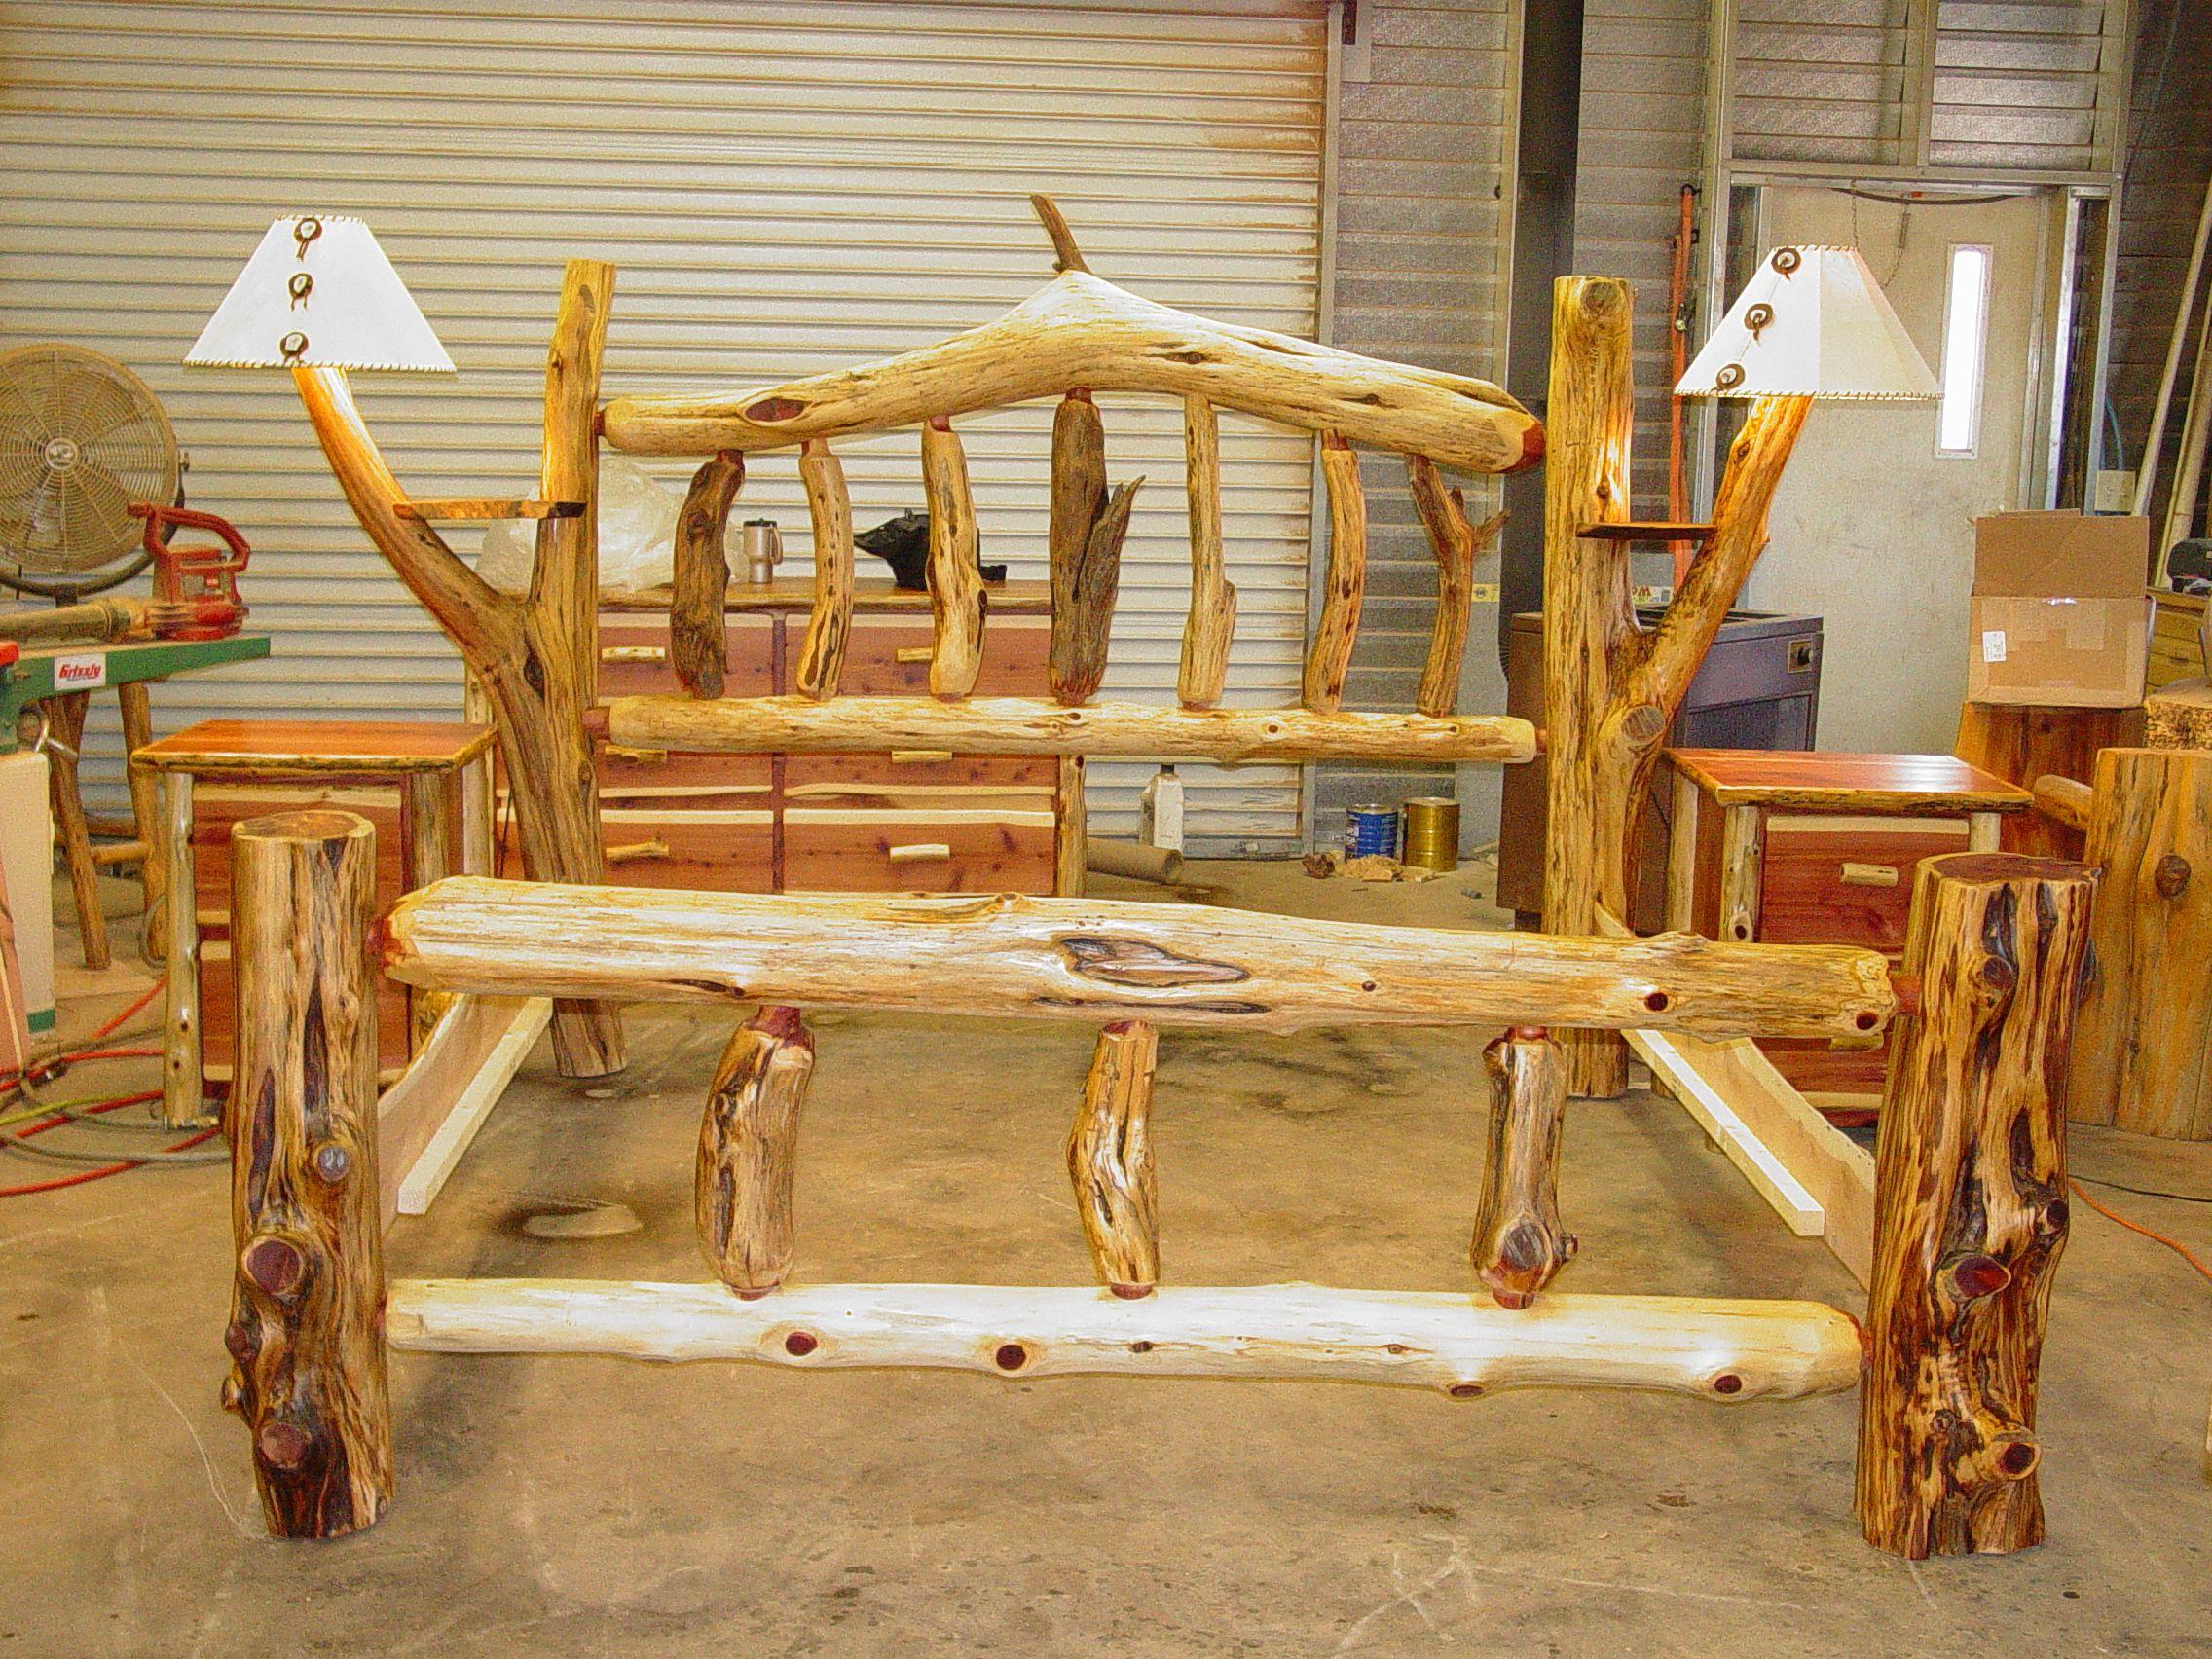 Rustic Log Beds Twisted Juniper Beds Wood Bed Design Rustic Bedding Rustic Log Furniture